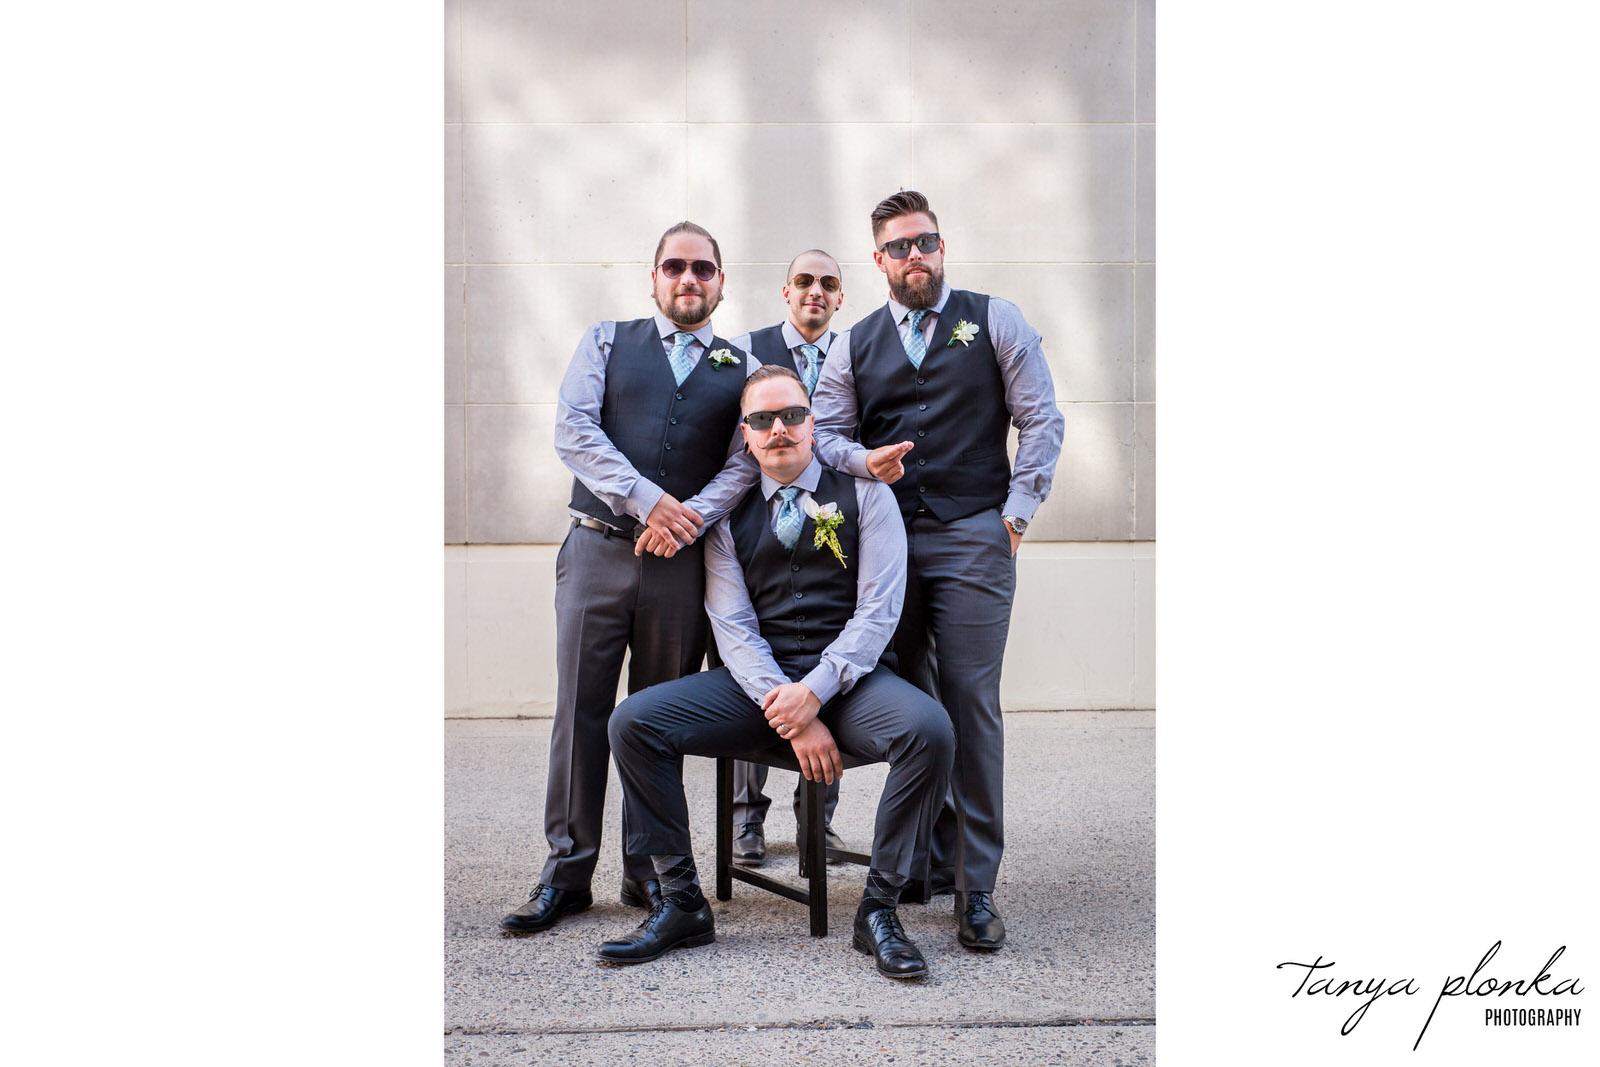 groomsmen pose around groom sitting on chair in alley